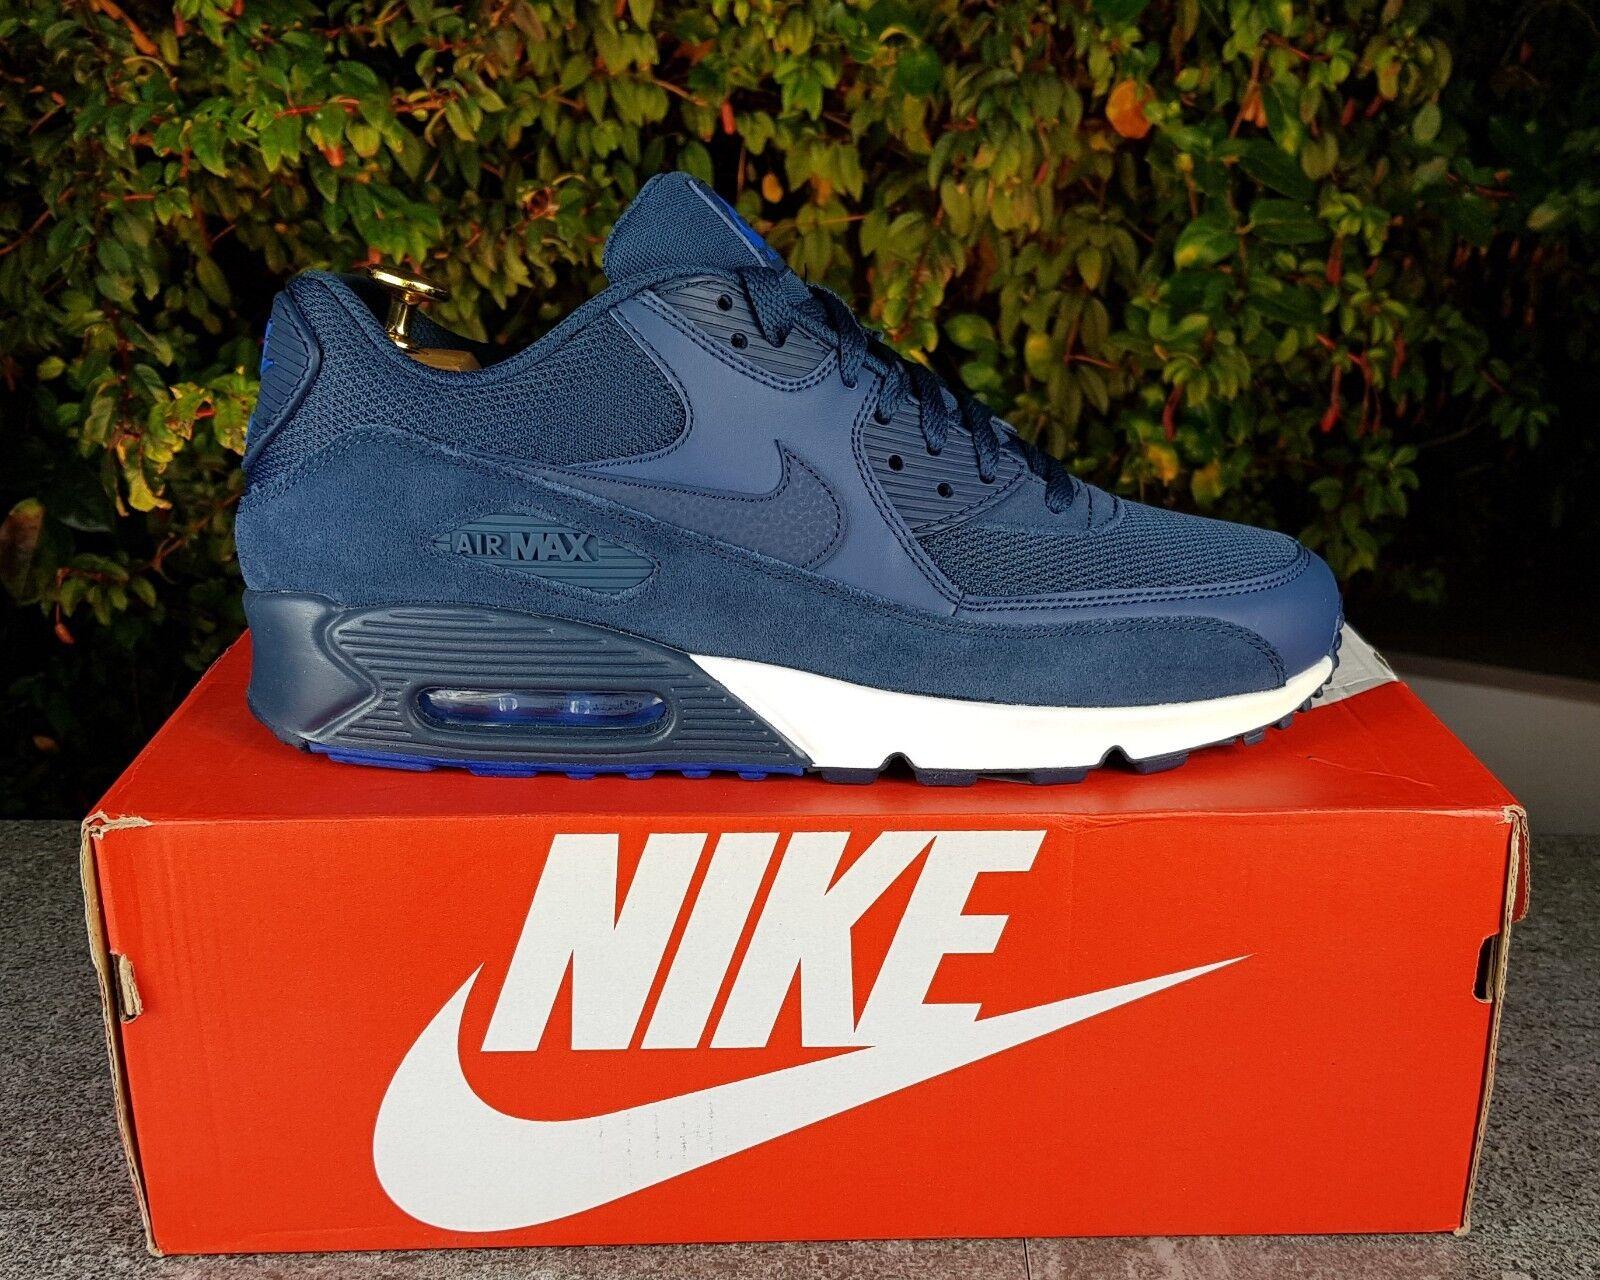 73df76a2de Nike air Blanco max Negro Rojo Blanco air 90 essential zapatos hombre,  Negro d9c549